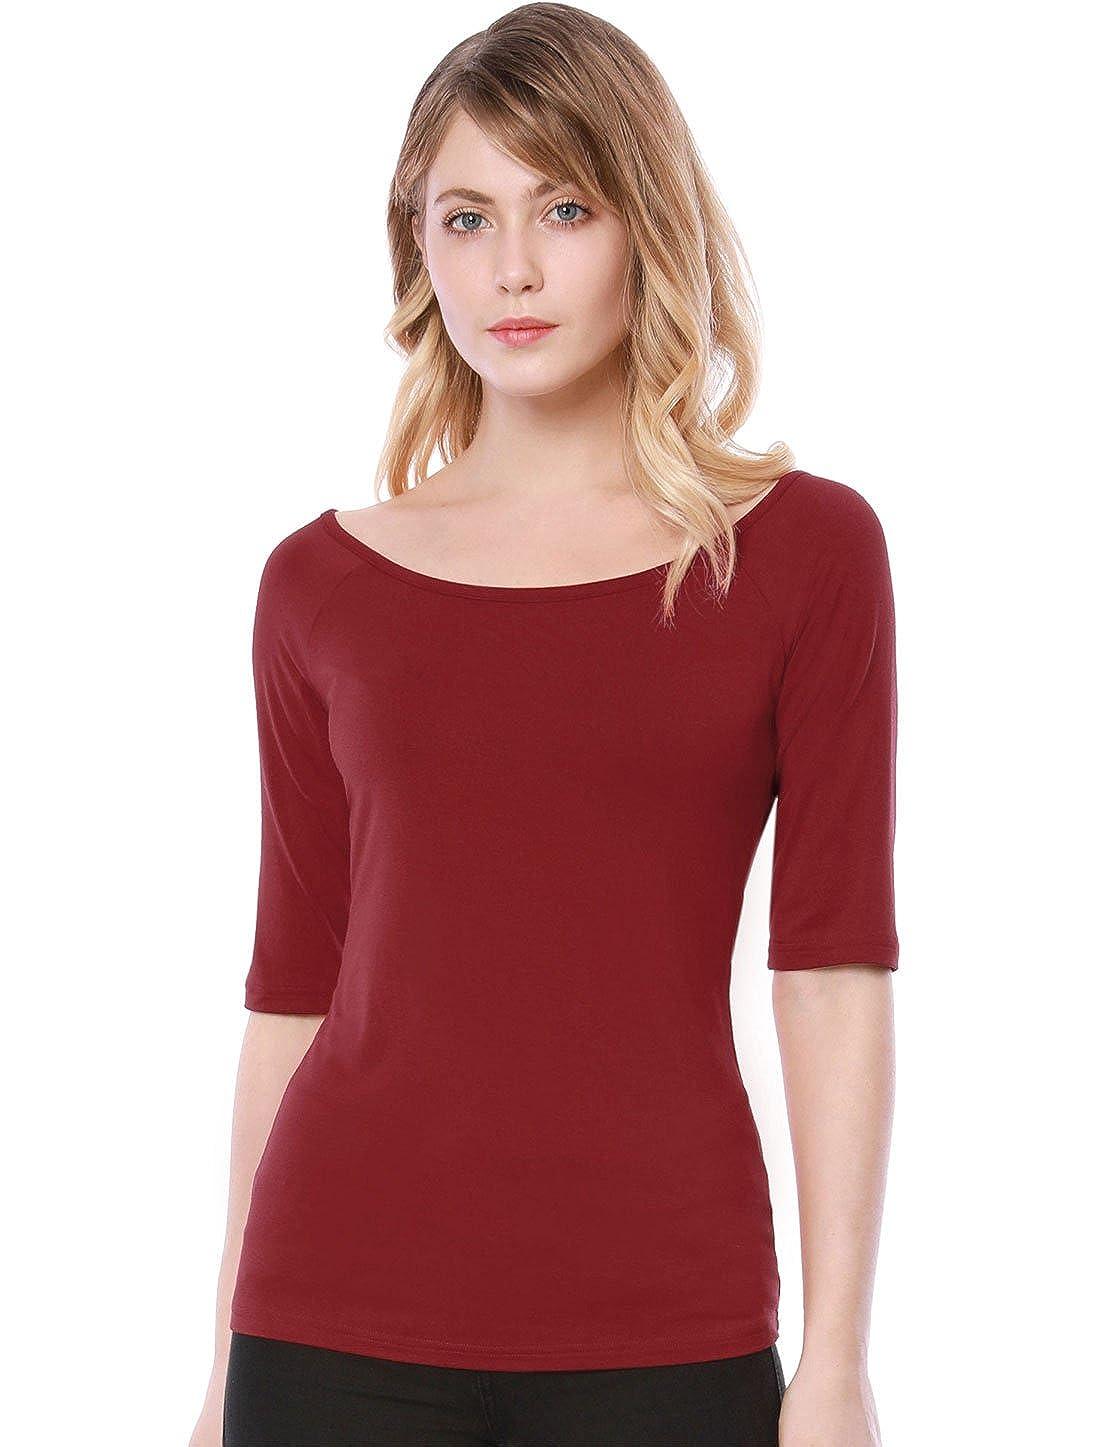 TALLA S. Allegra K Camiseta para Mujer Medias Mangas con Cuello Redondo Ajustado